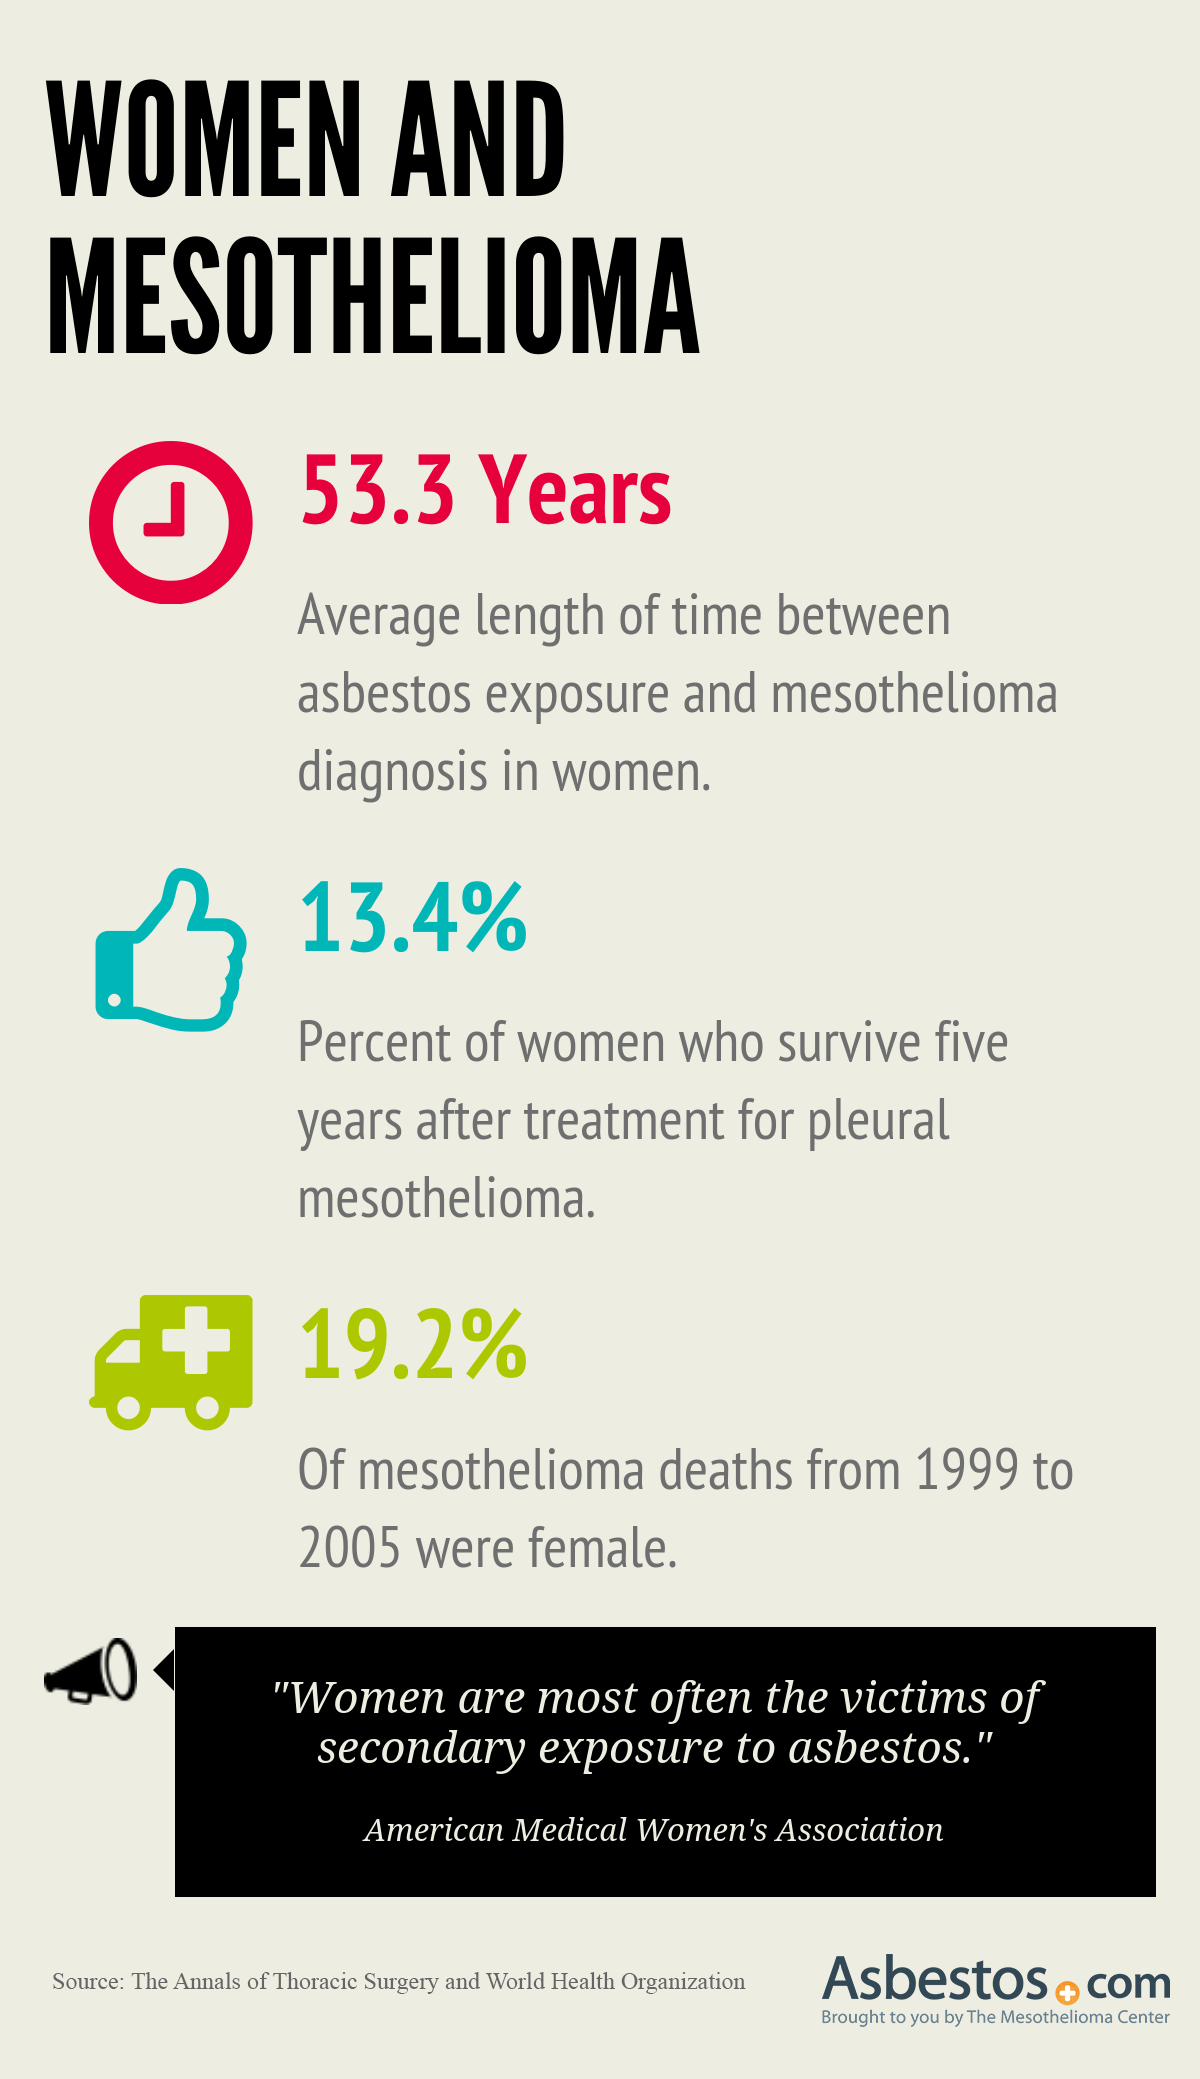 Women and Mesothelioma